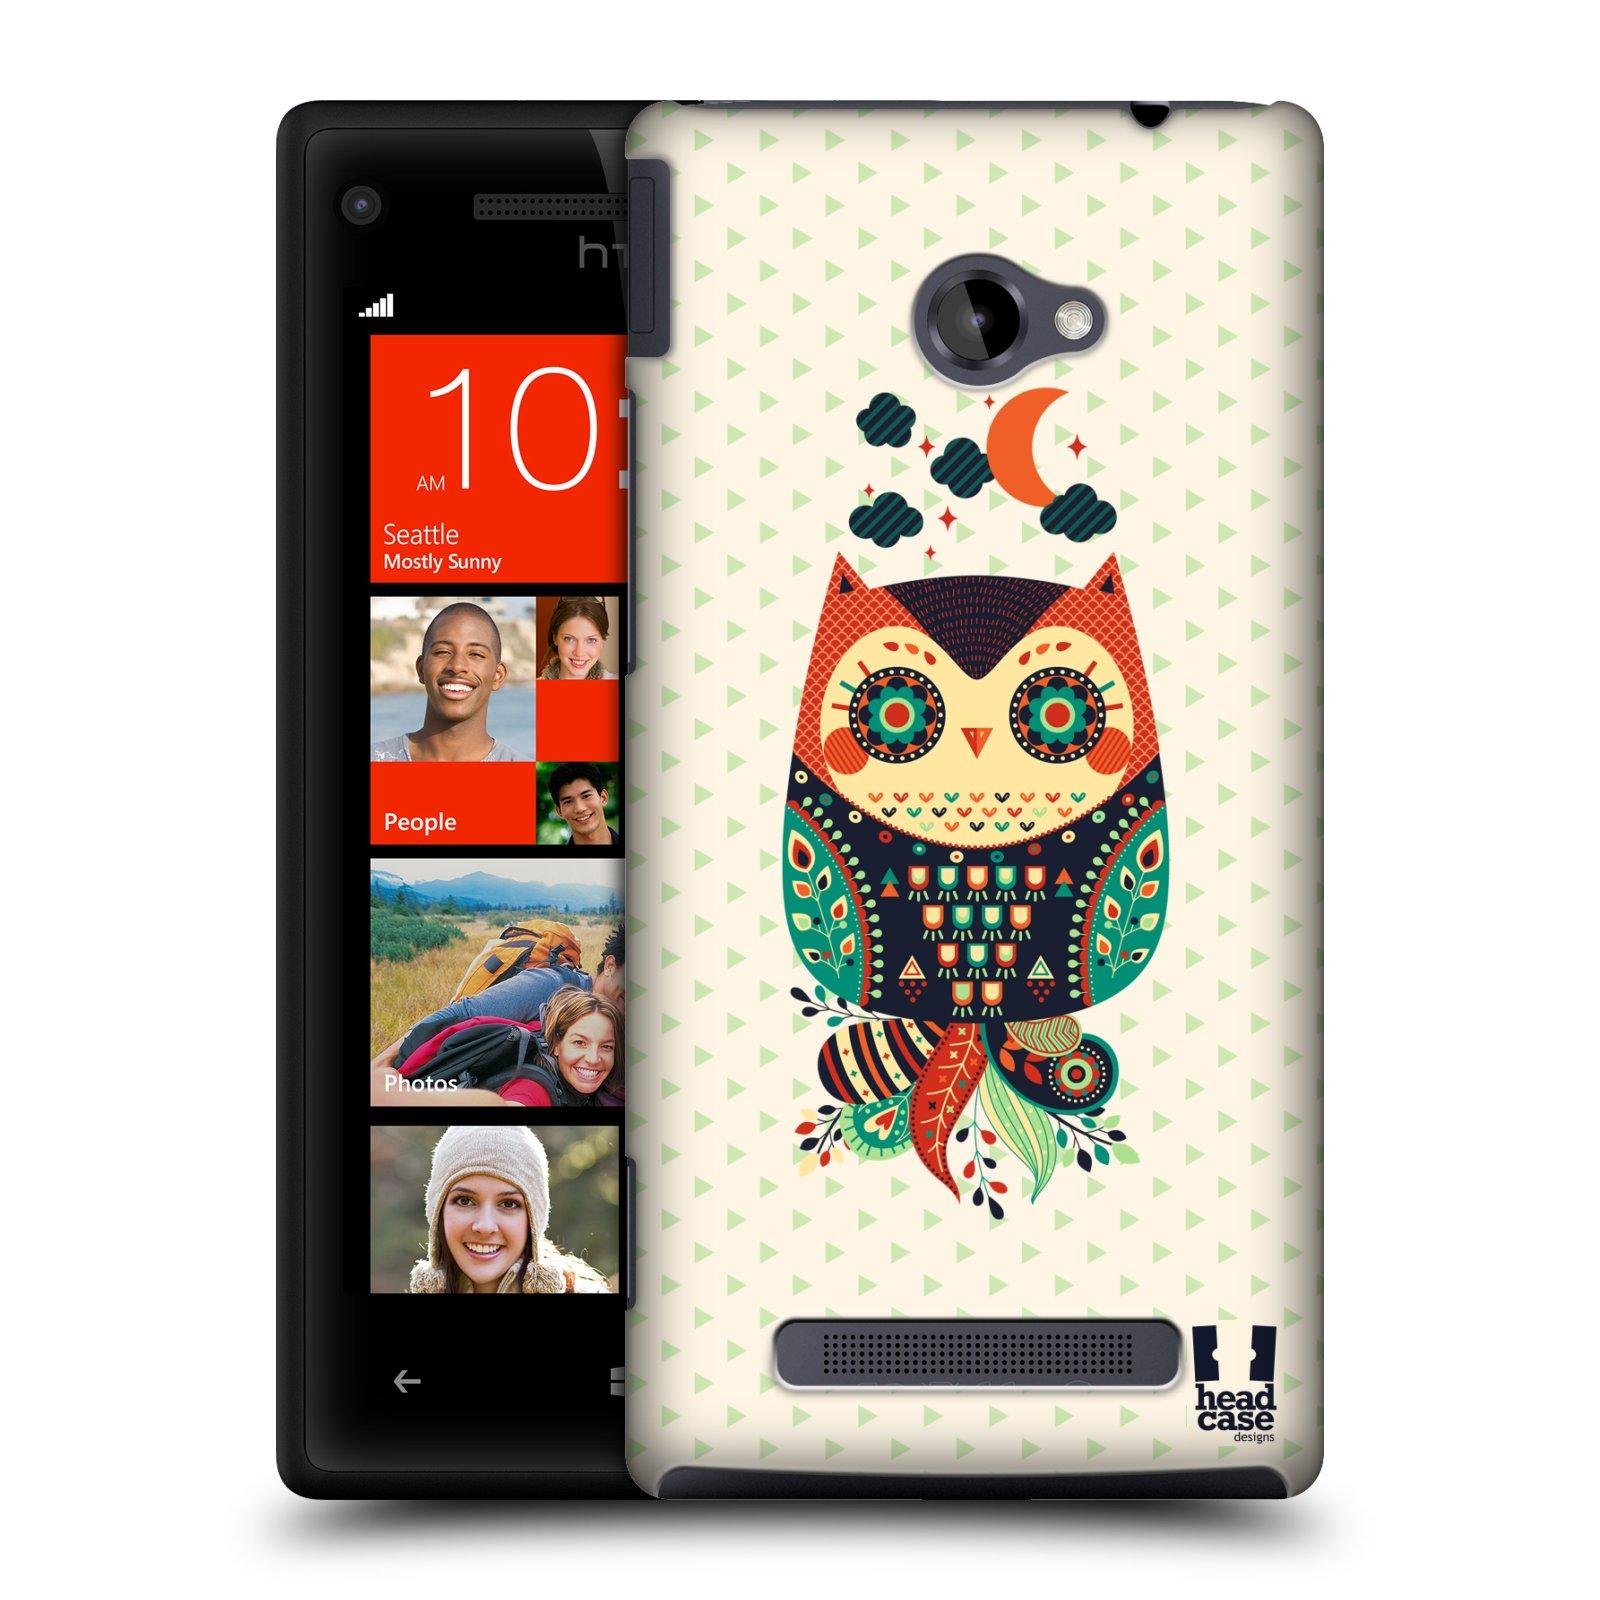 HEAD CASE DESIGNS NIGHTFALL OWLS CASE COVER FOR HTC WINDOWS PHONE 8X